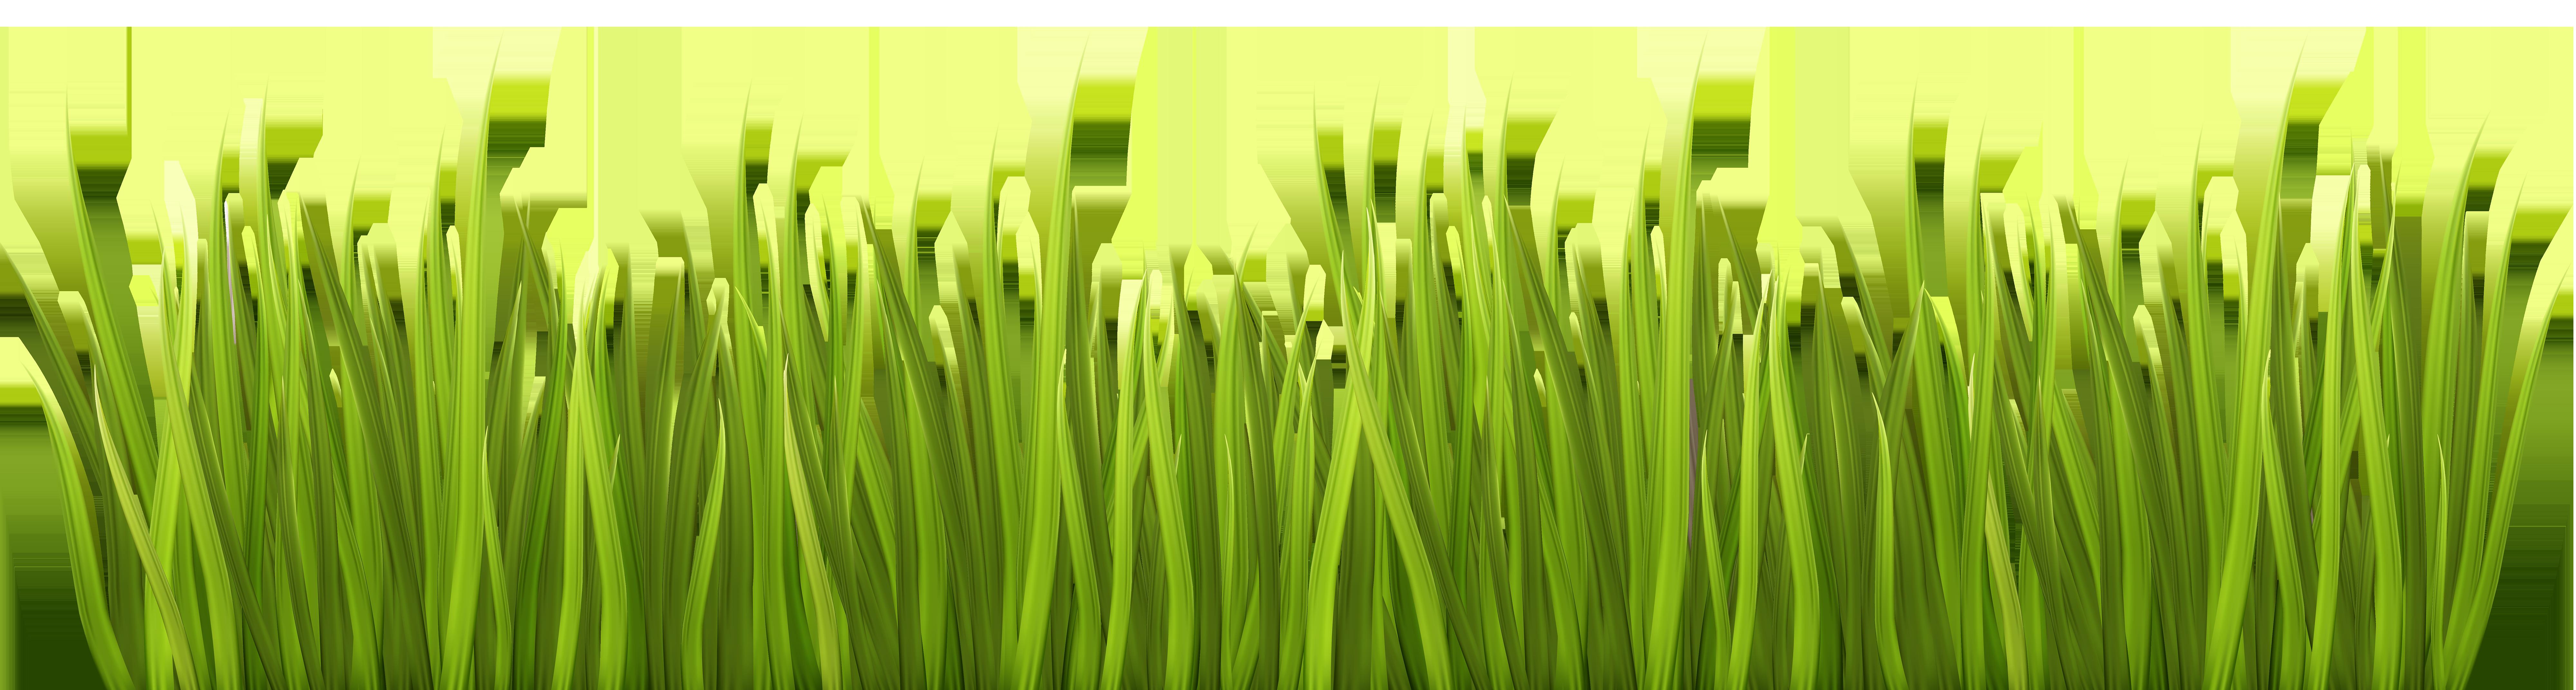 Grass clipart spring. Png transparent clip art